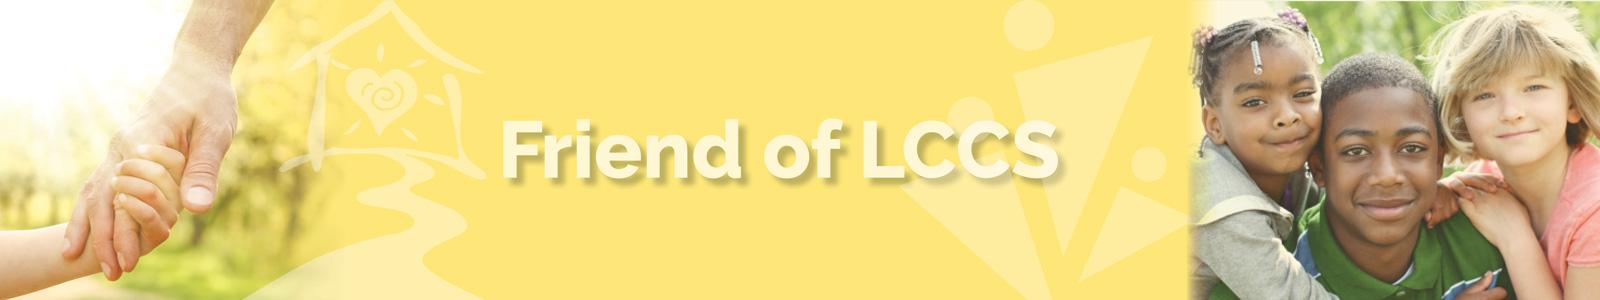 Friends of LCCS